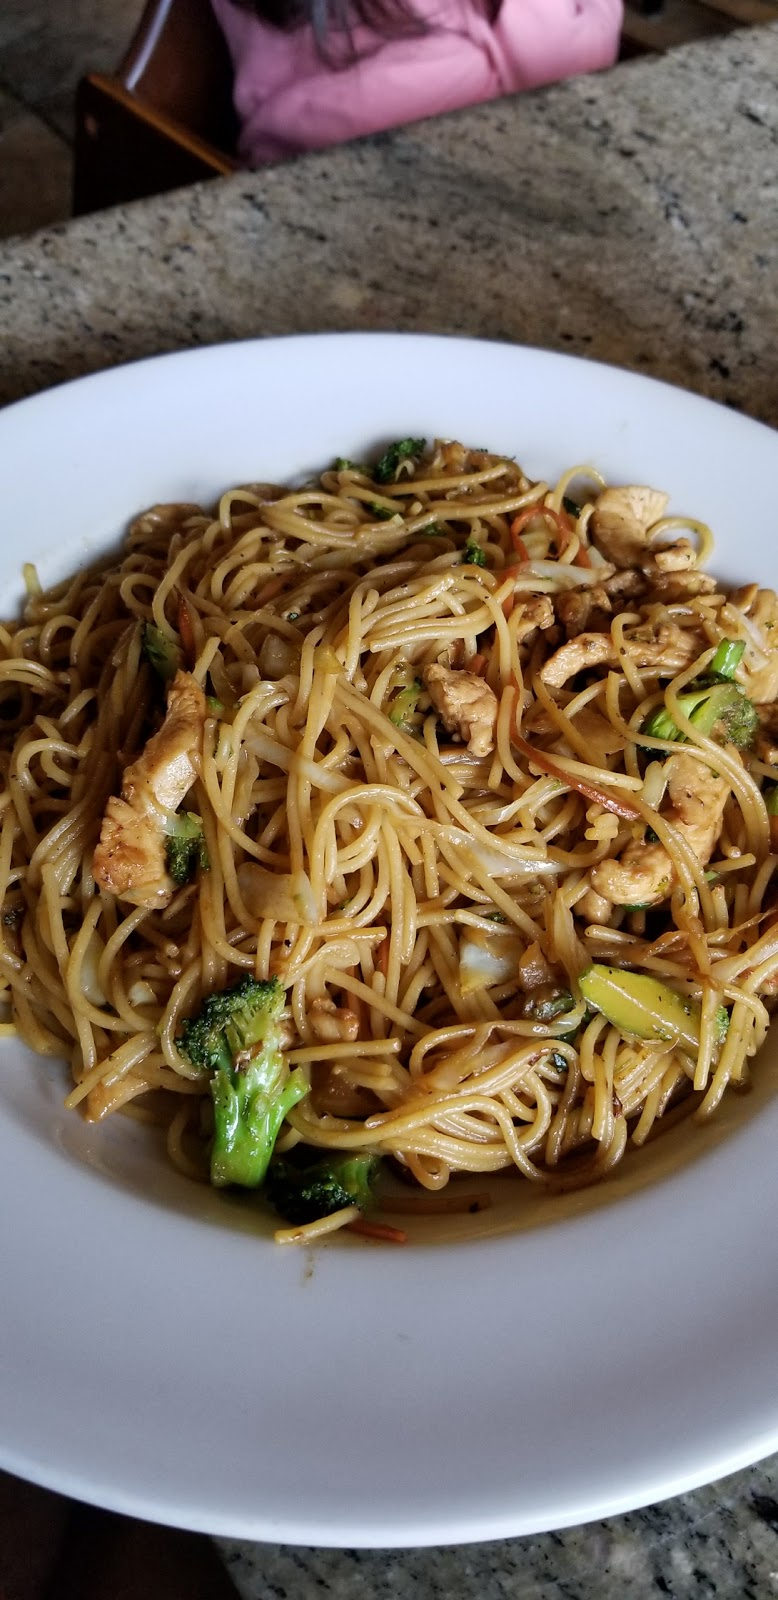 Zen Seafood & Sushi Grill - restaurant    Photo 10 of 10   Address: 5517 McPherson Rd #8, Laredo, TX 78041, USA   Phone: (956) 568-7767